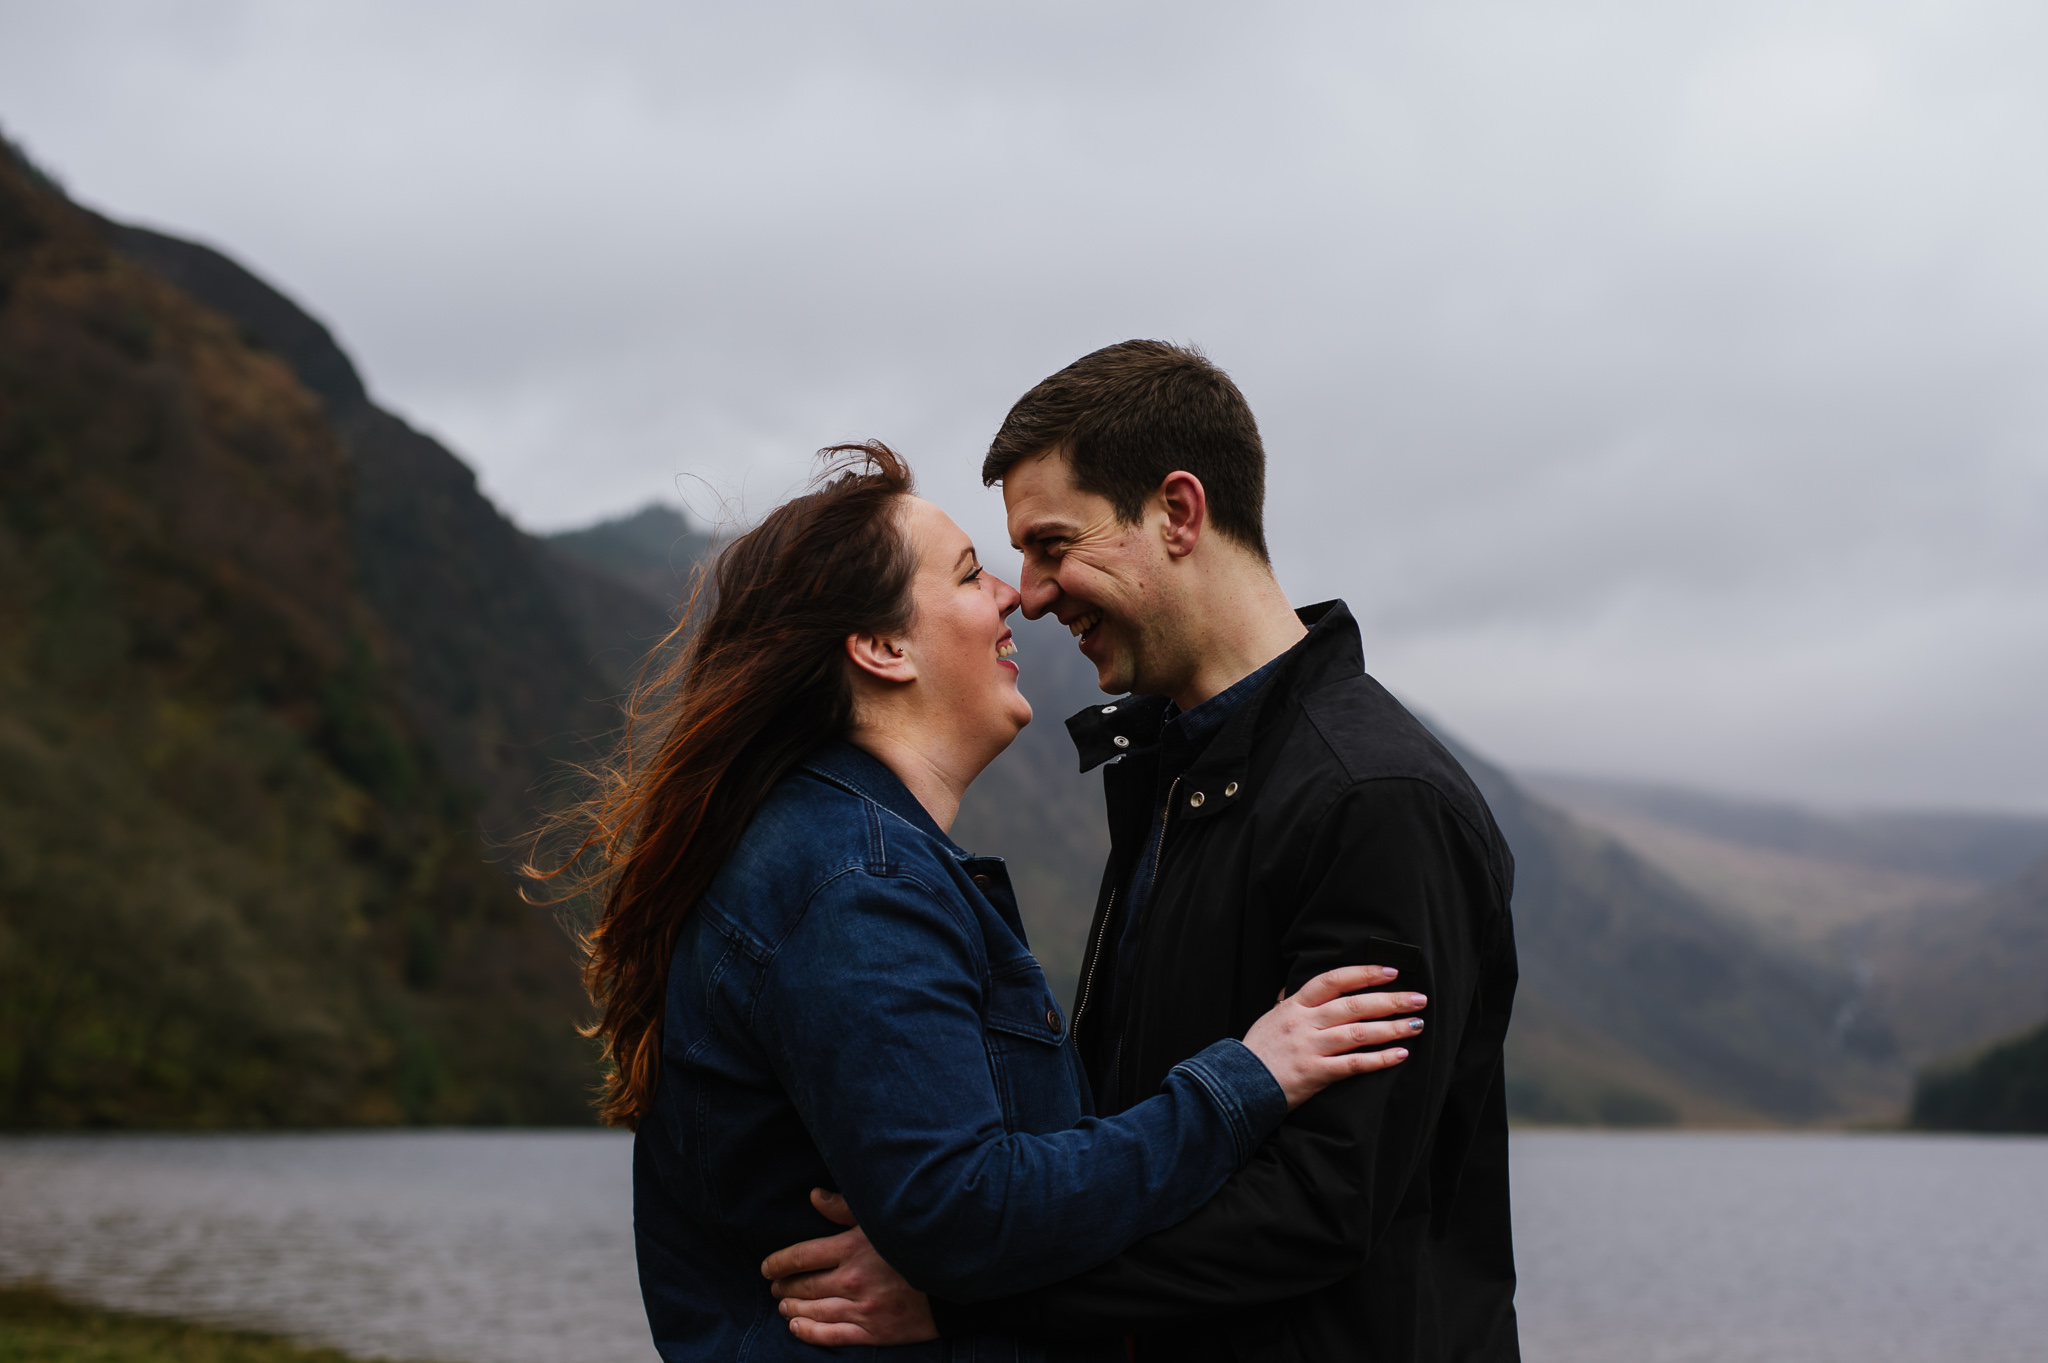 GlendaloughEngagementPhotographyIreland-10.jpg